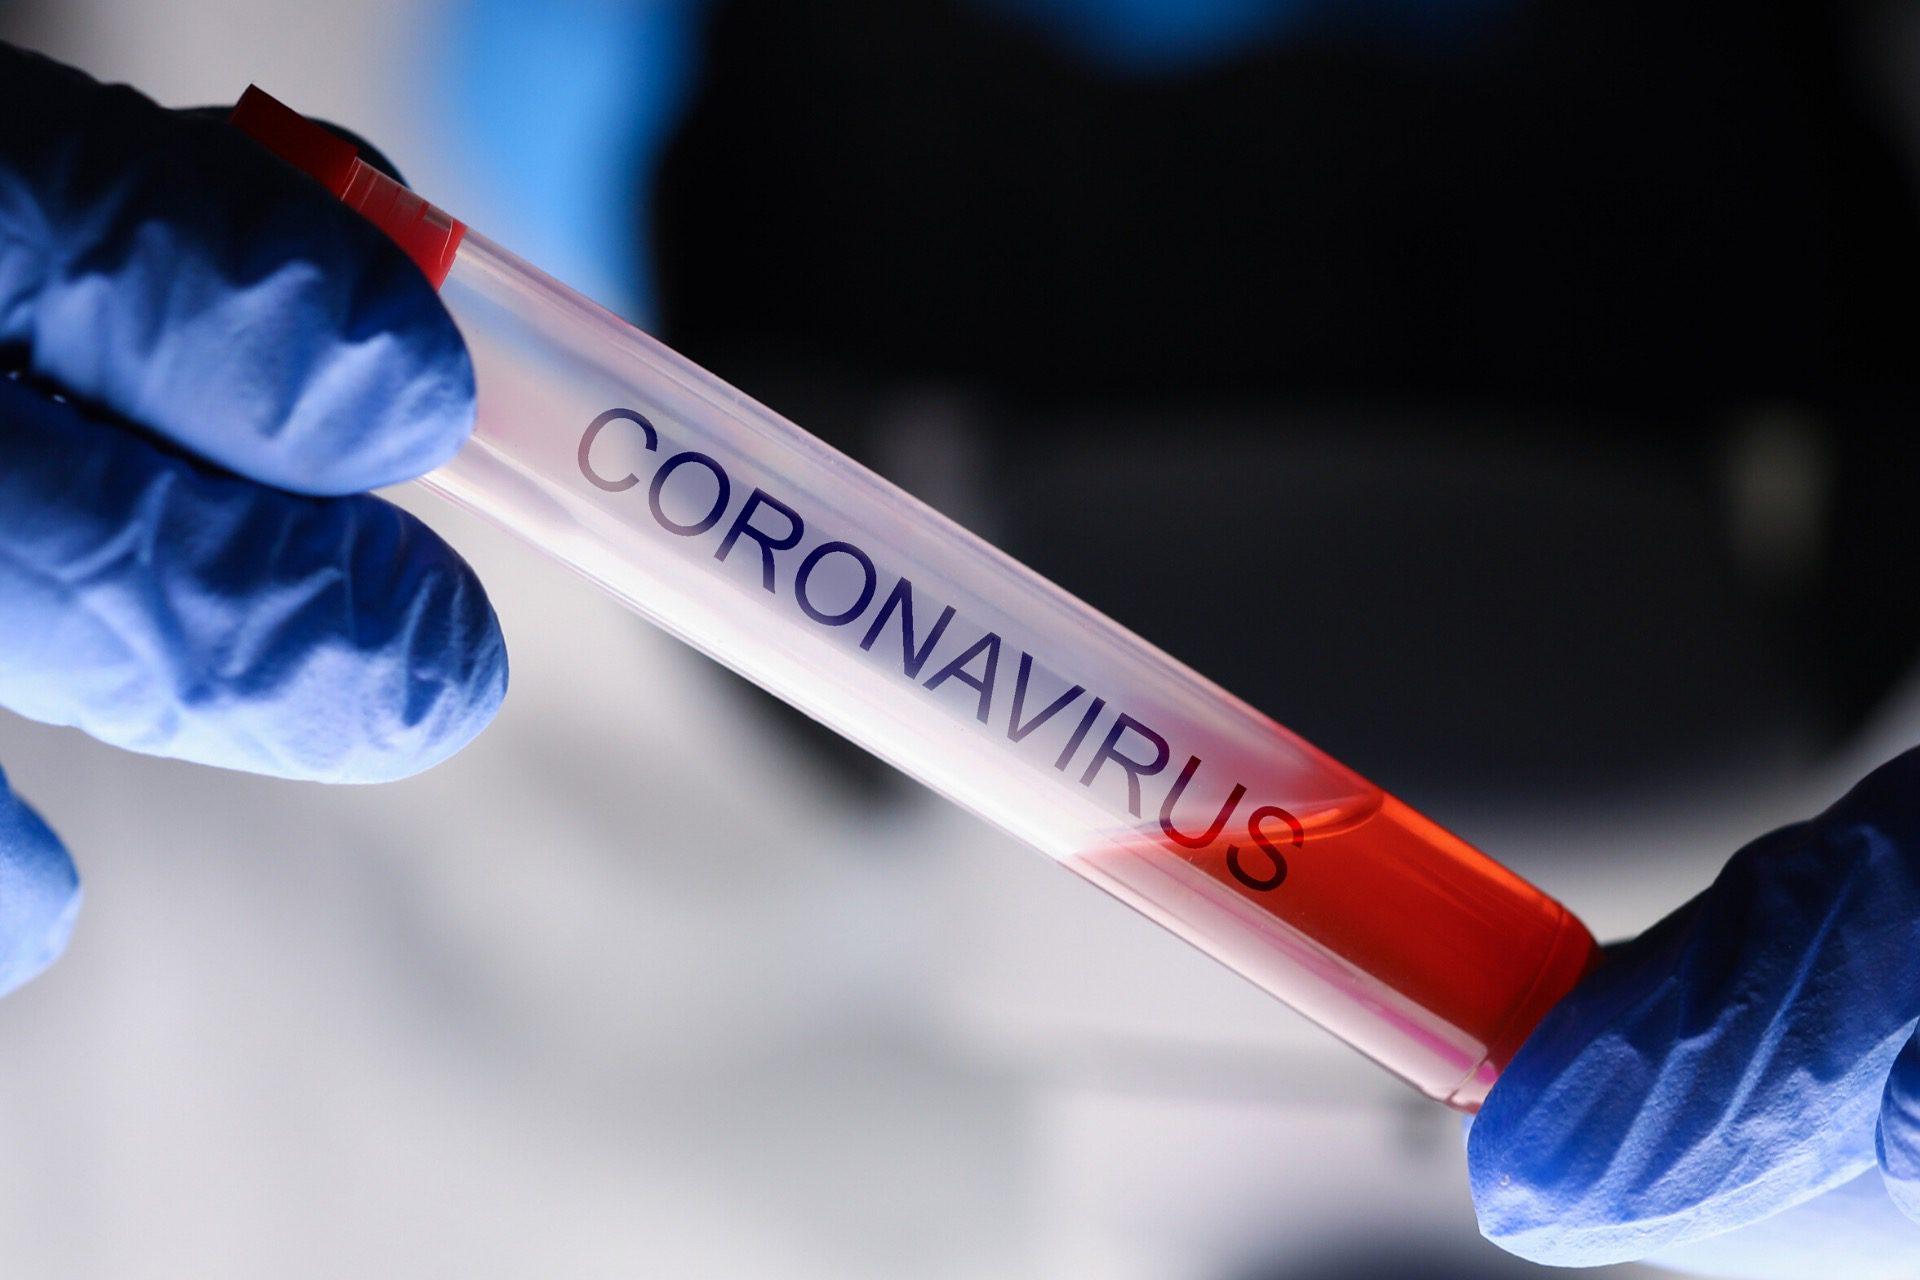 Reisen in Zeiten des Corona Virus